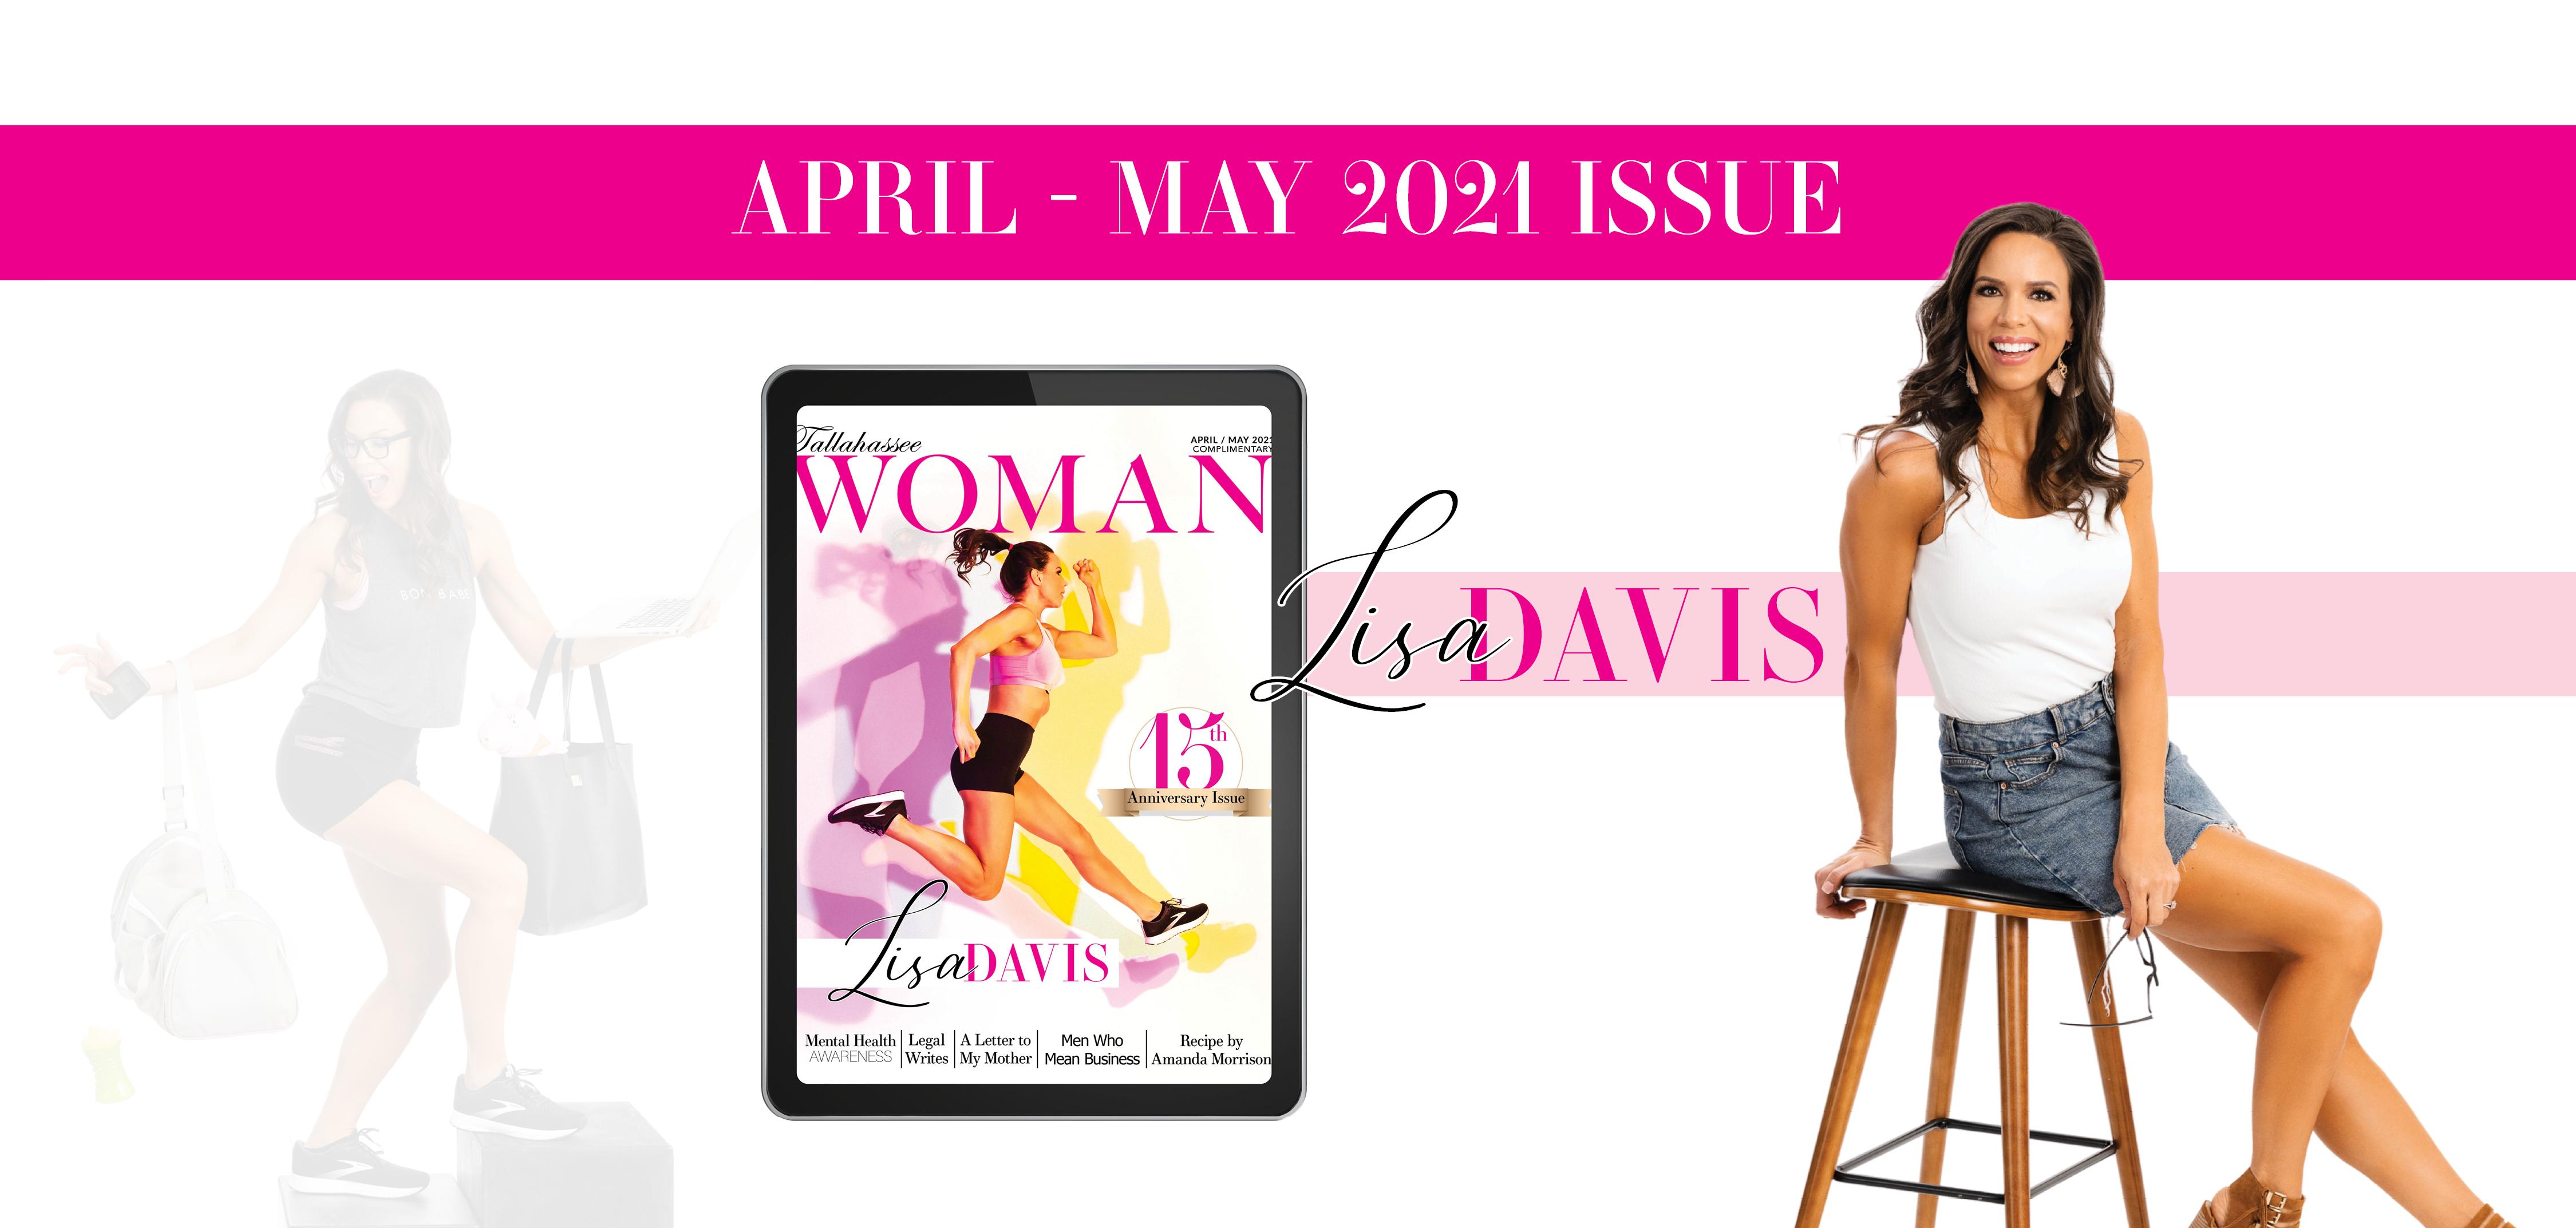 TWM Cover Woman Lisa Davis